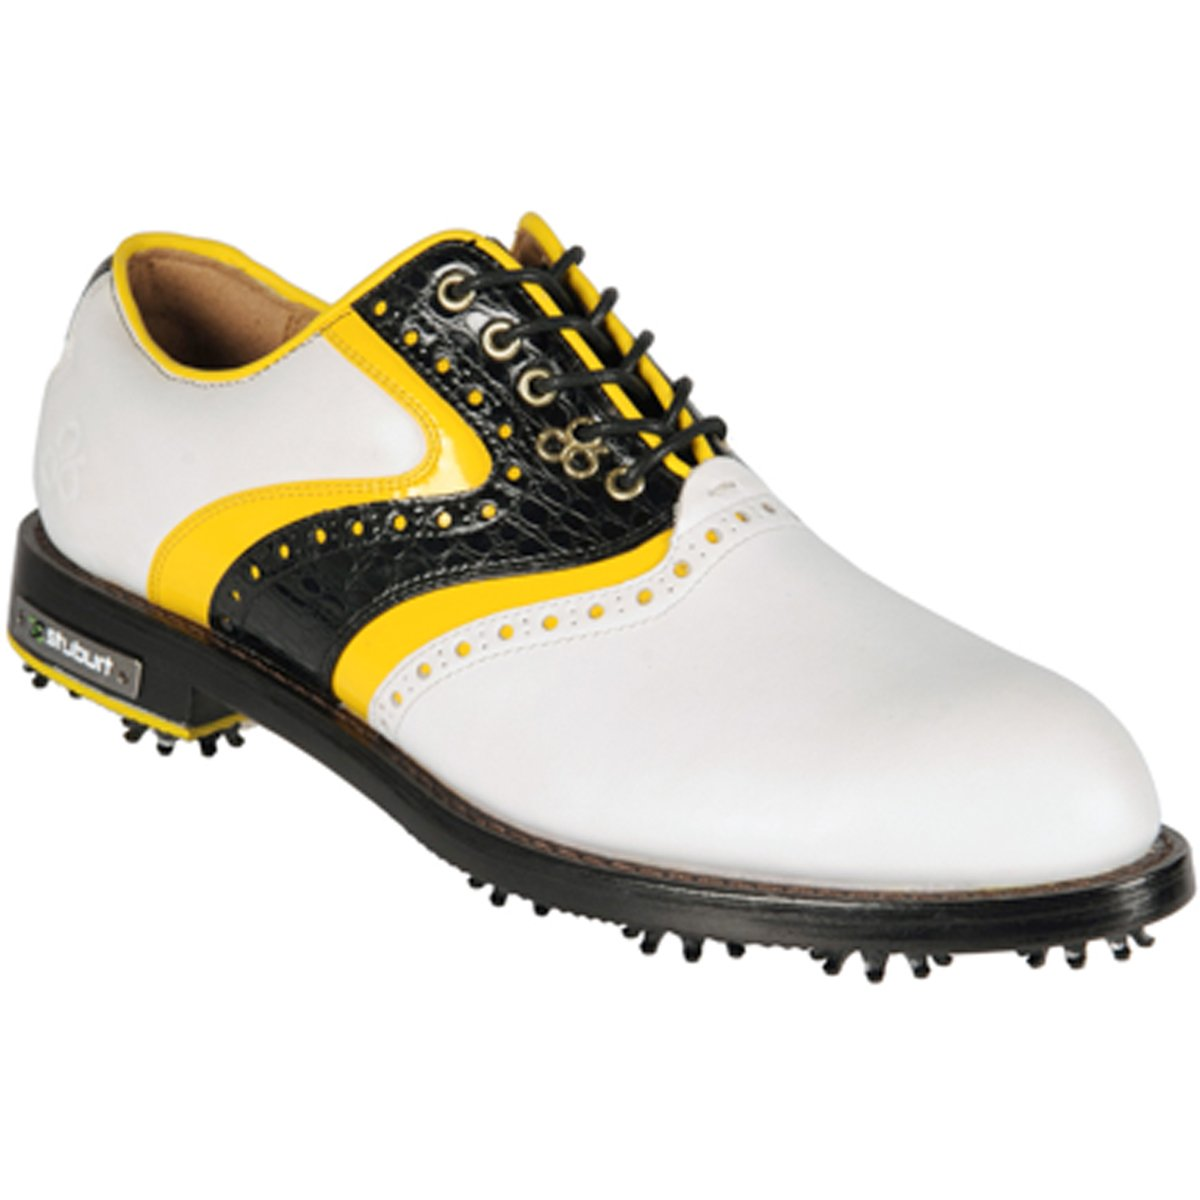 [Stuburt] メンズDCCクラシックゴルフシューズ 11 D(M) US White/black/yellow B009VIJ8Y6